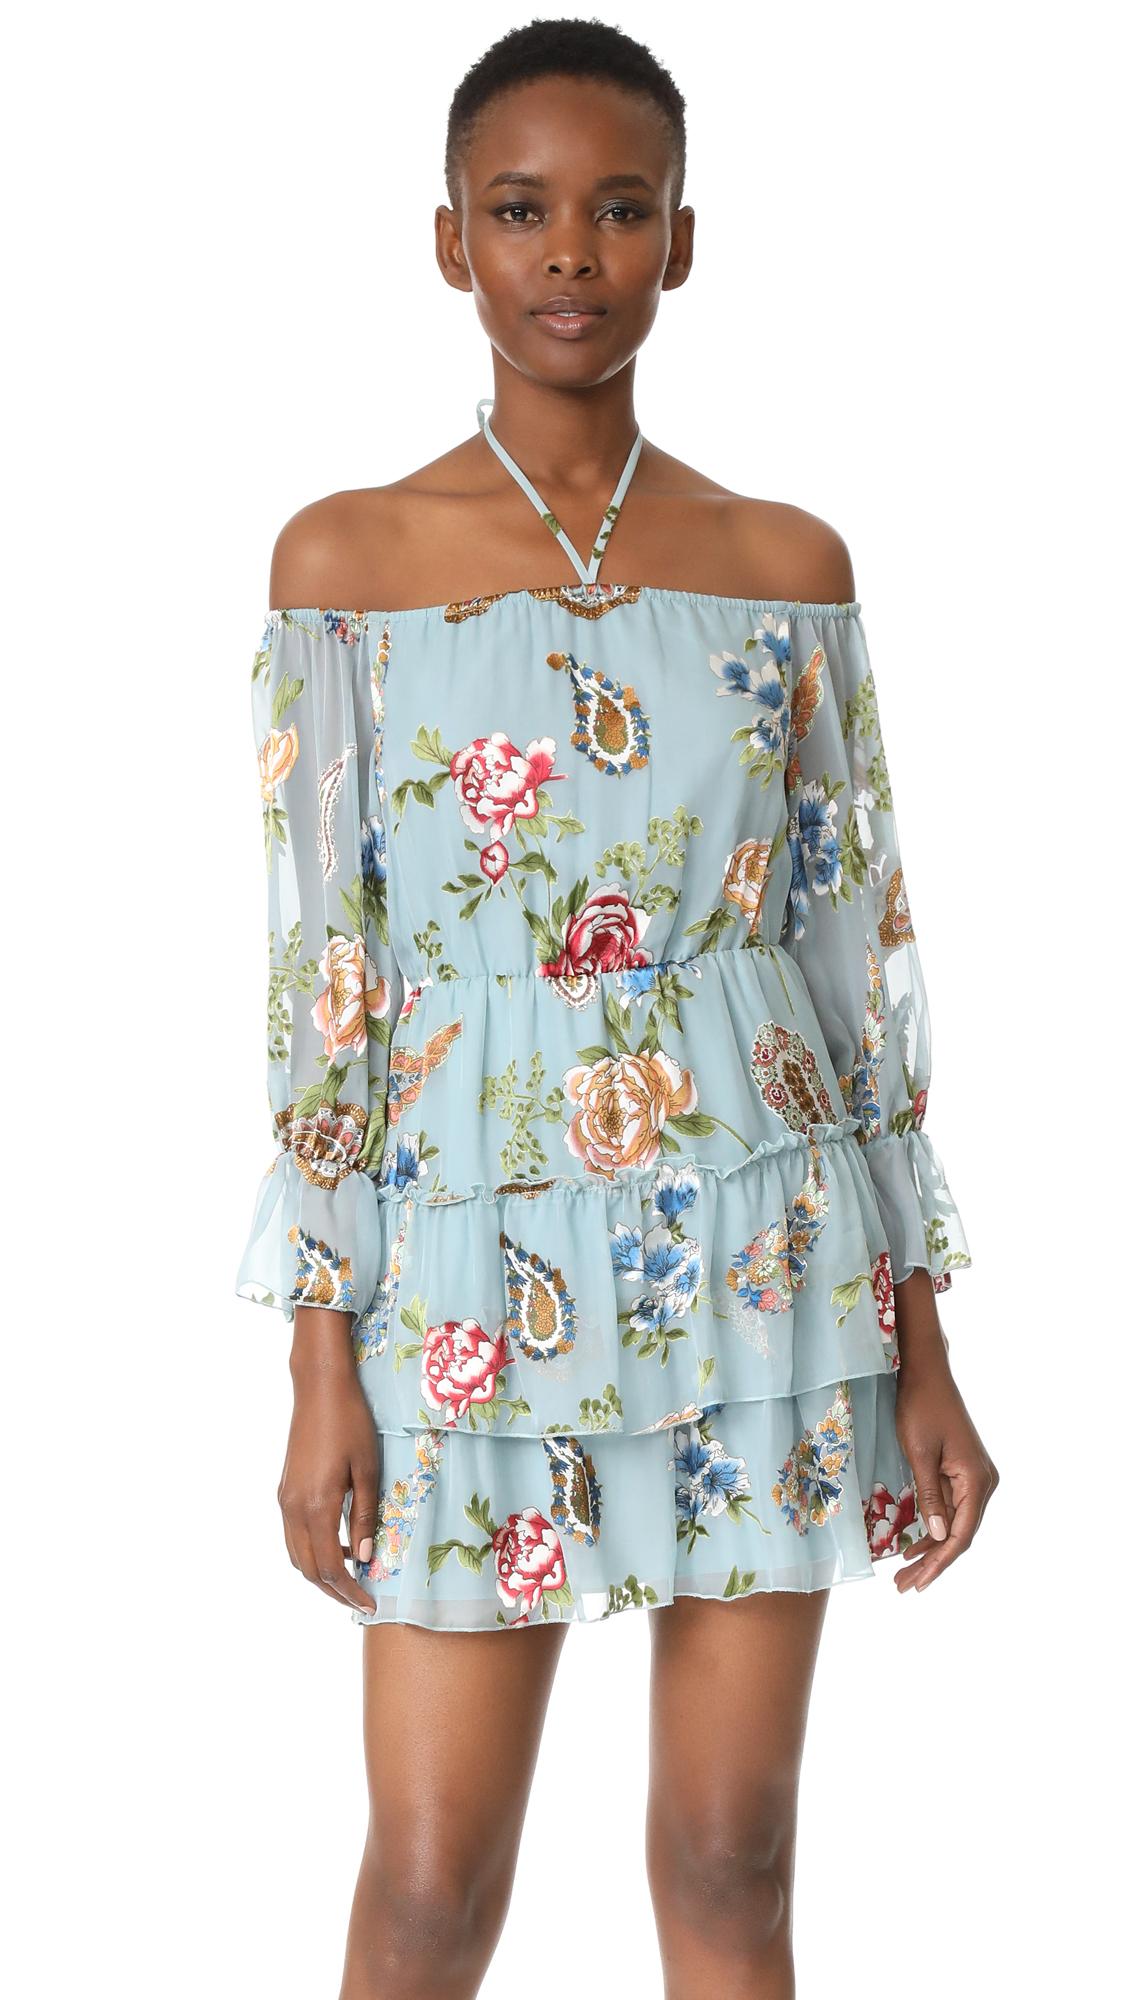 alice + olivia Waylon Blouson Sleeve Dress - Icy Aqua/Multi